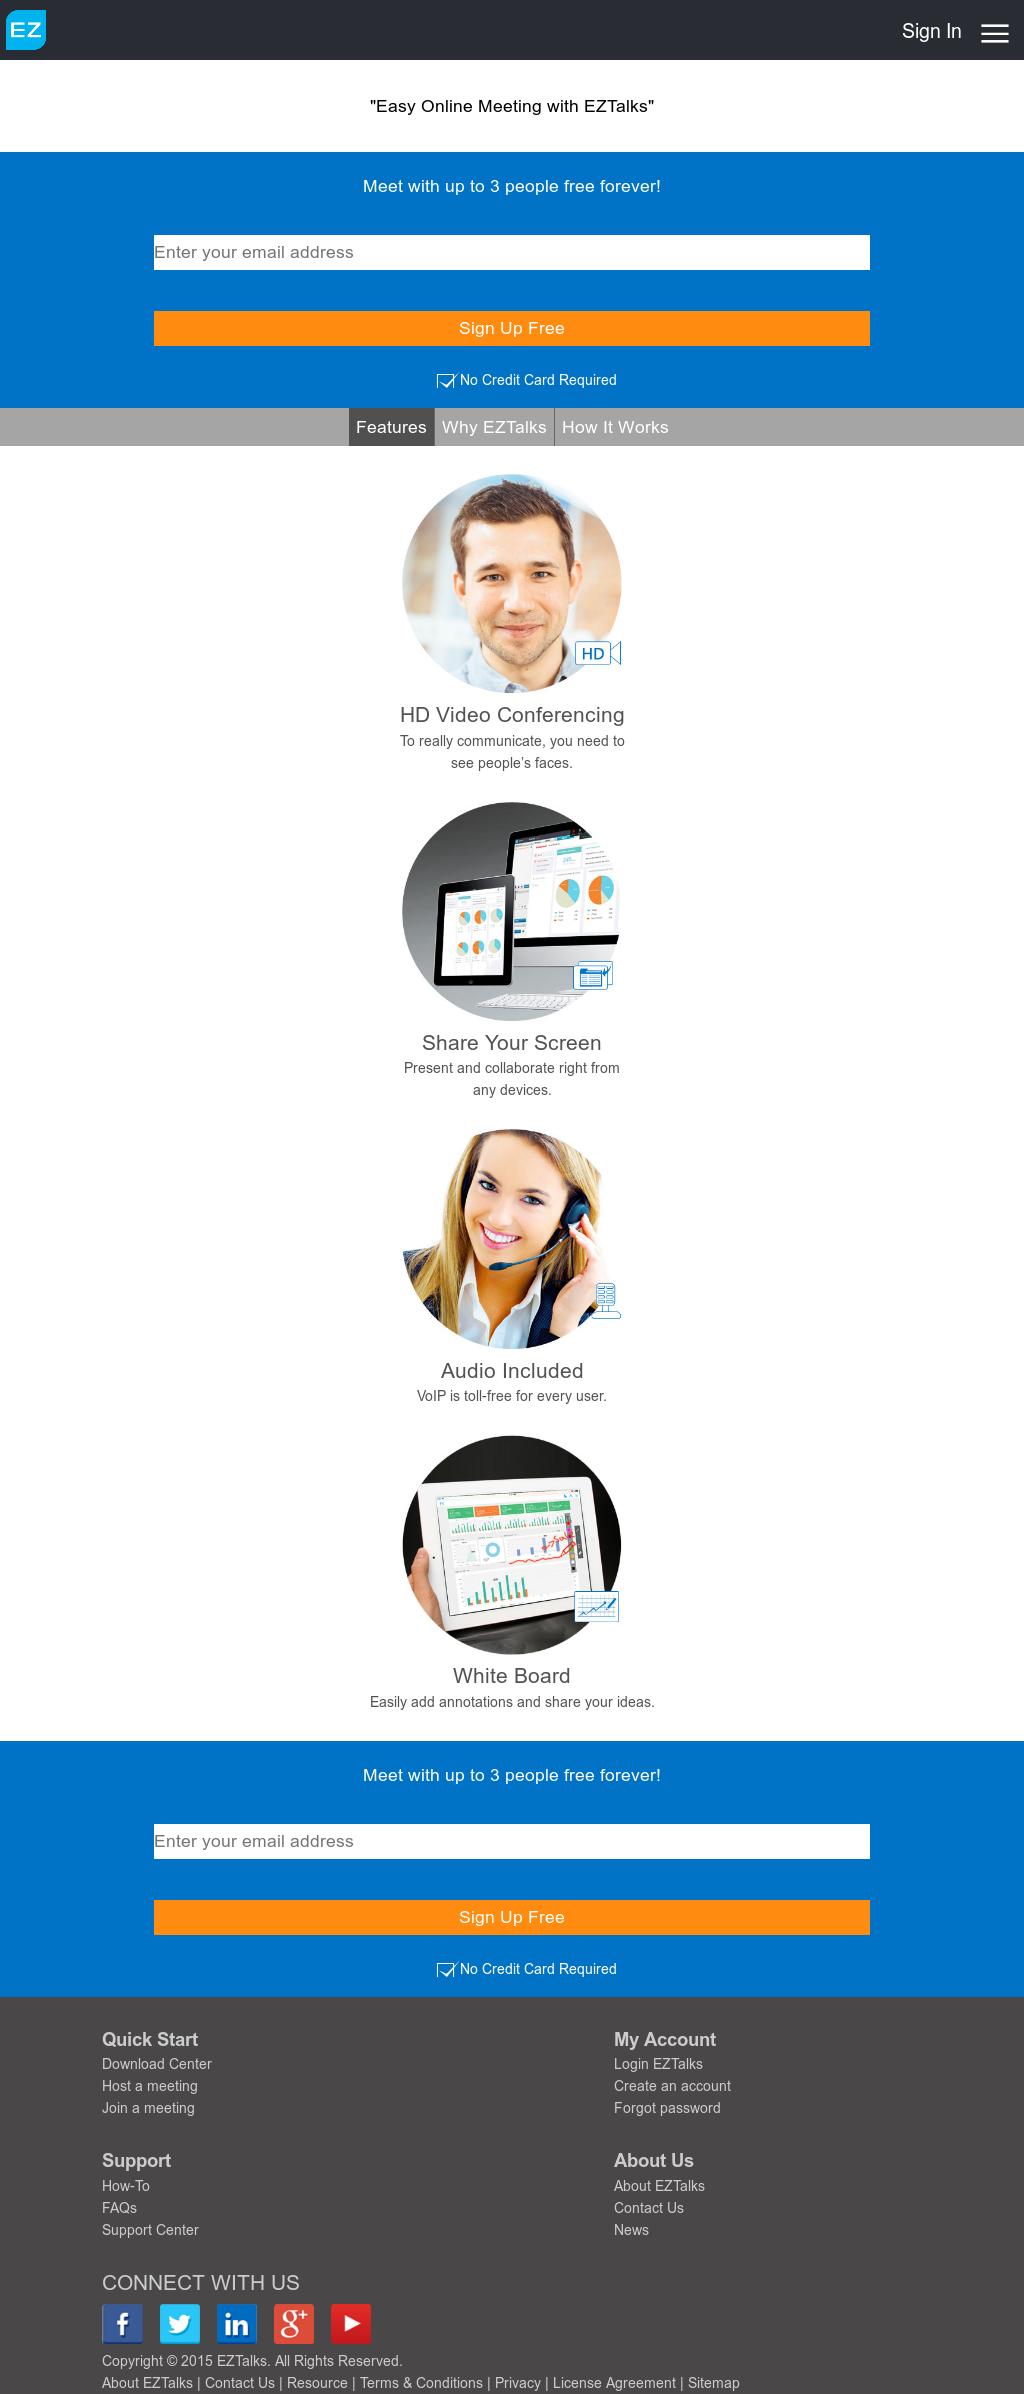 EZTalks Competitors, Revenue and Employees - Owler Company Profile